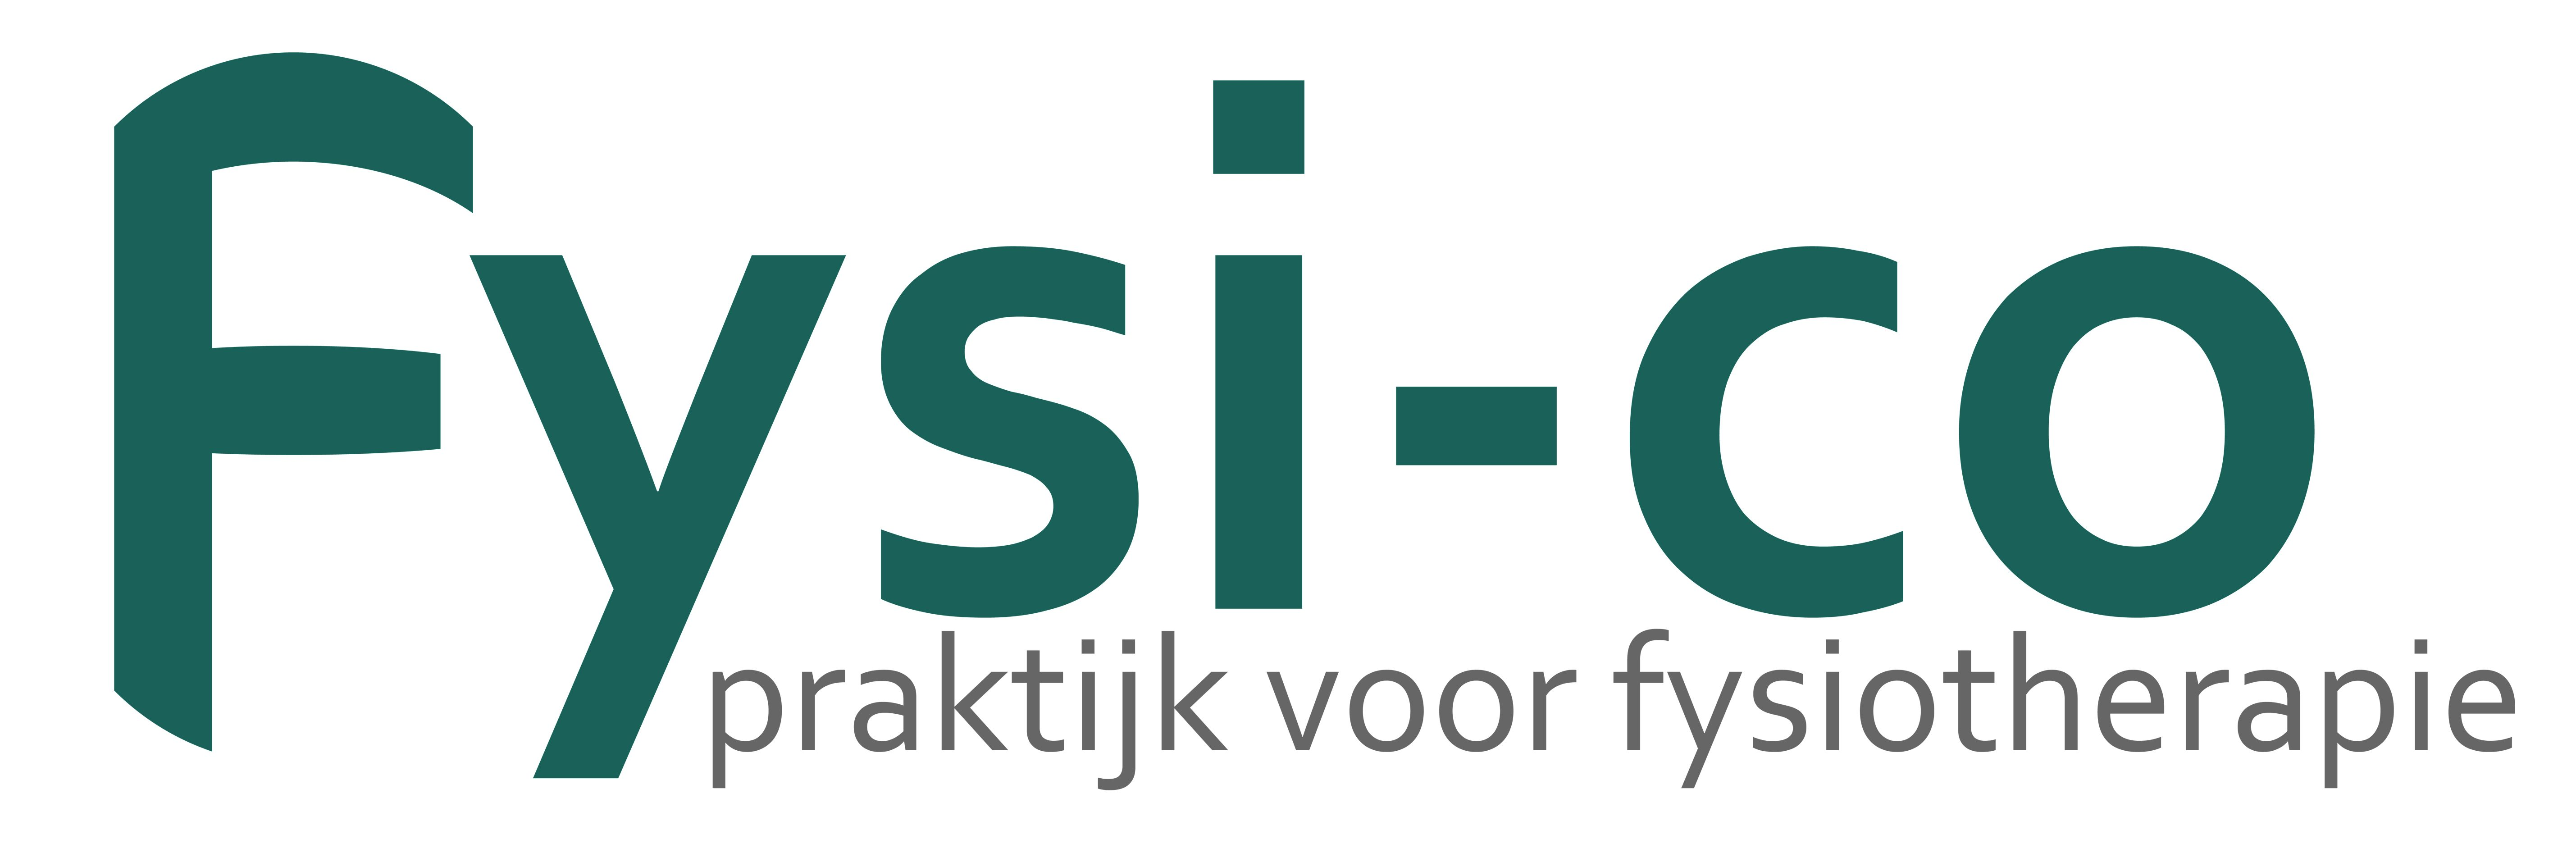 Fysi-co, praktijk voor fysiotherapie Wijchen